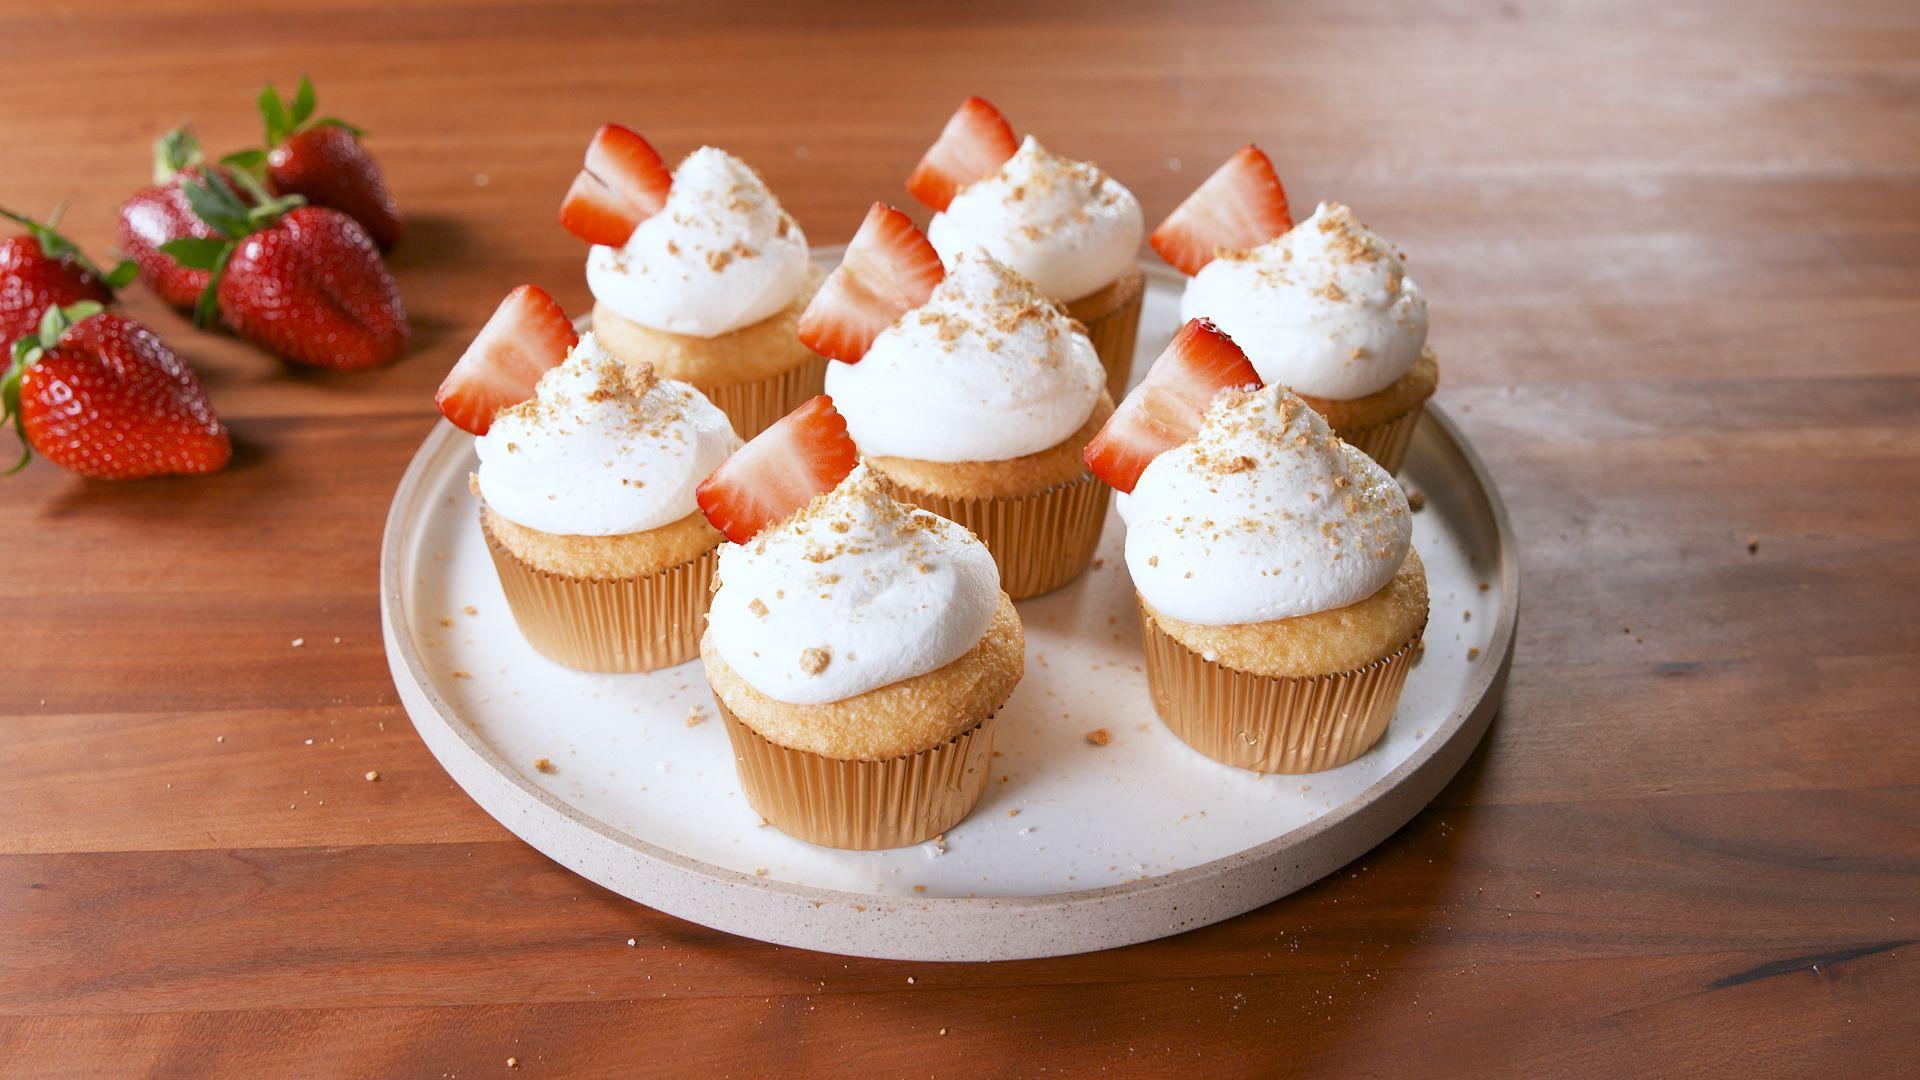 Strawberry Cheesecake Stuffed Cupcakes